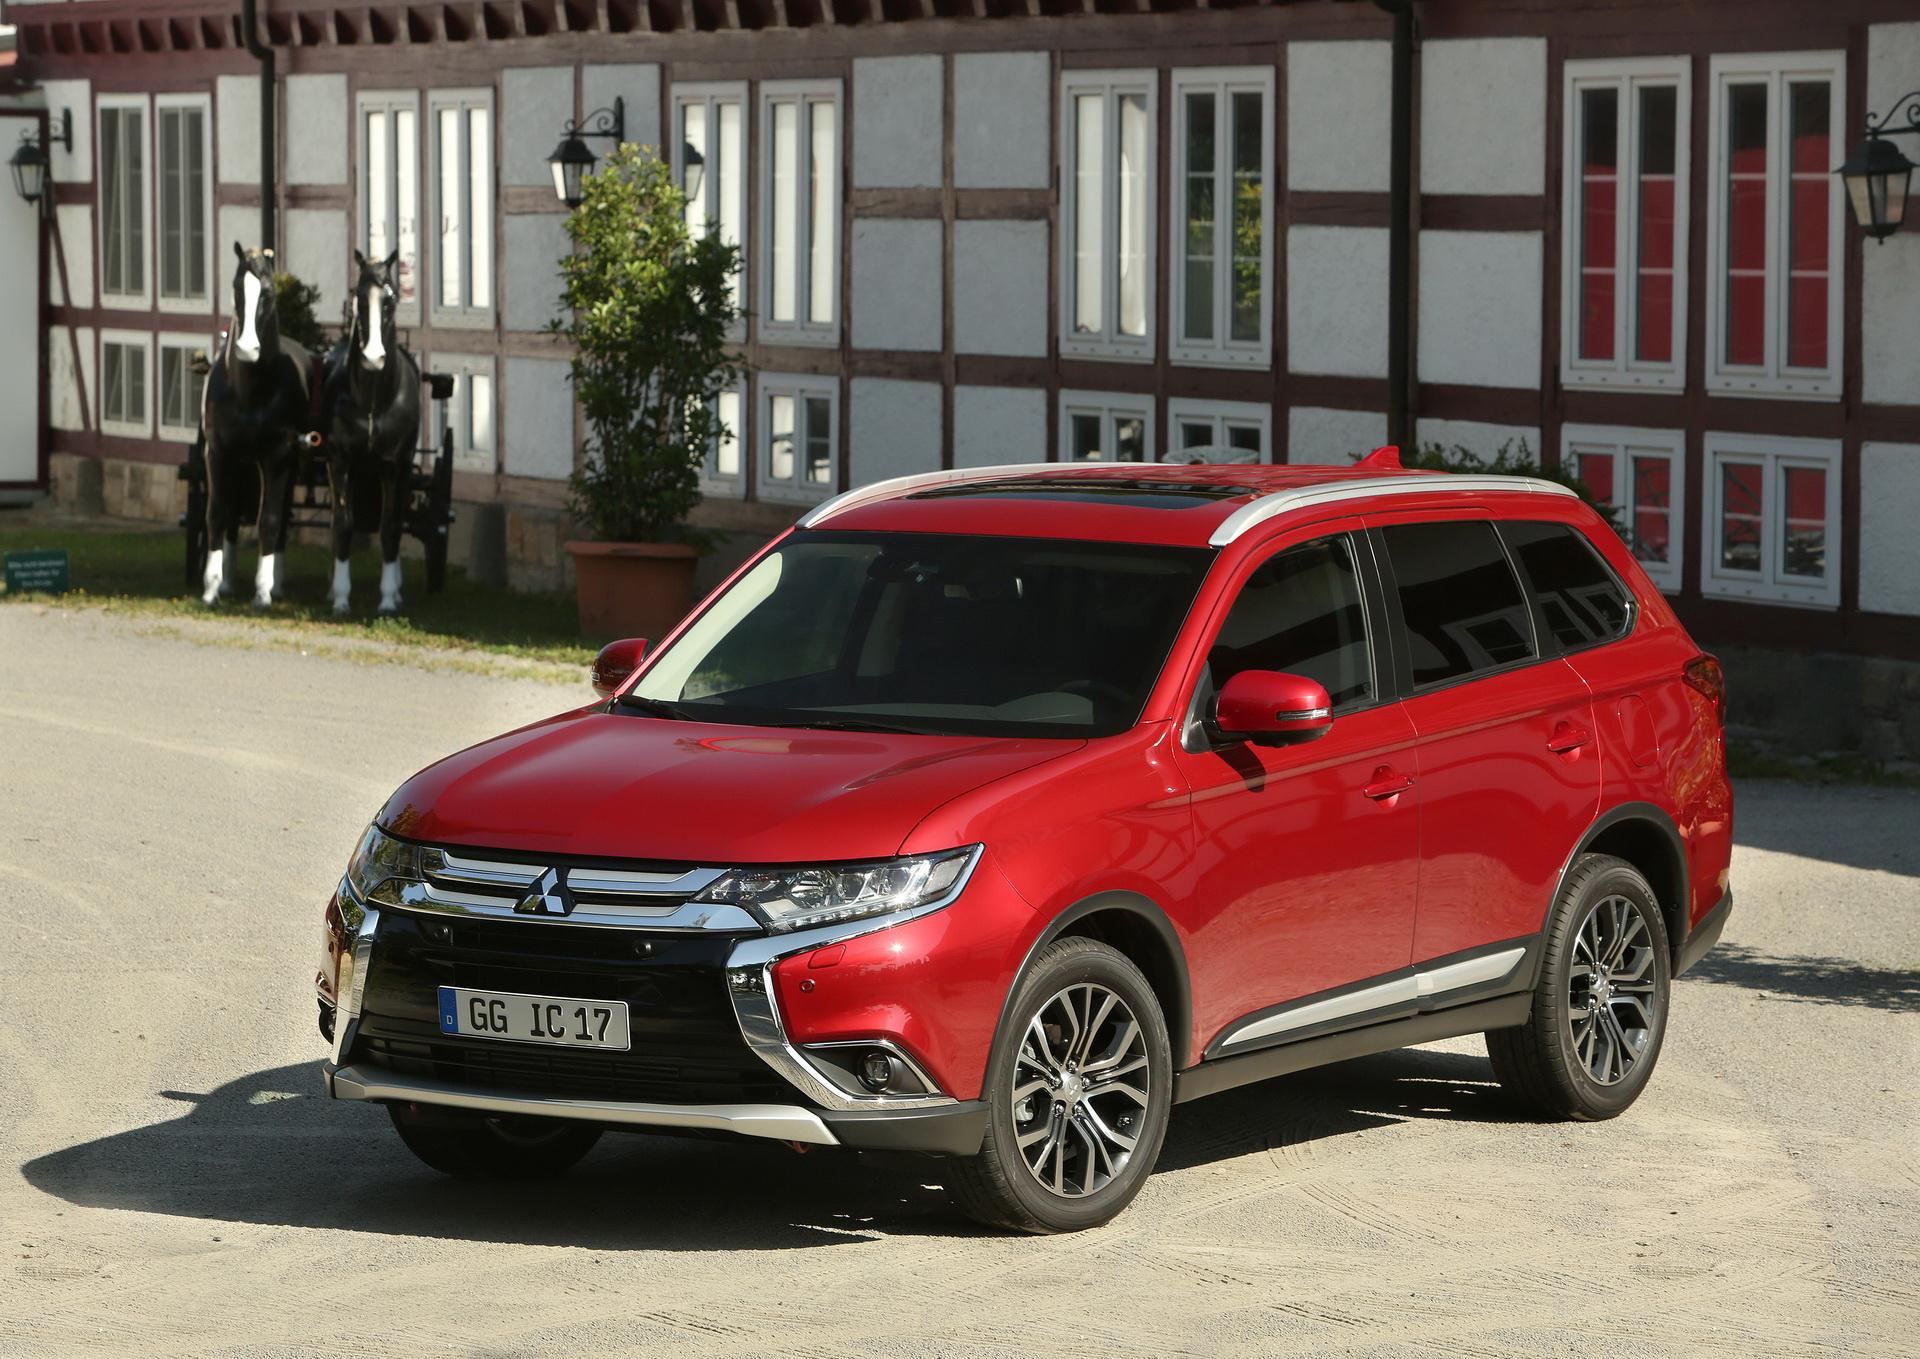 Mitsubishi investigada por uso ilegal de dispositivos fraudulentos